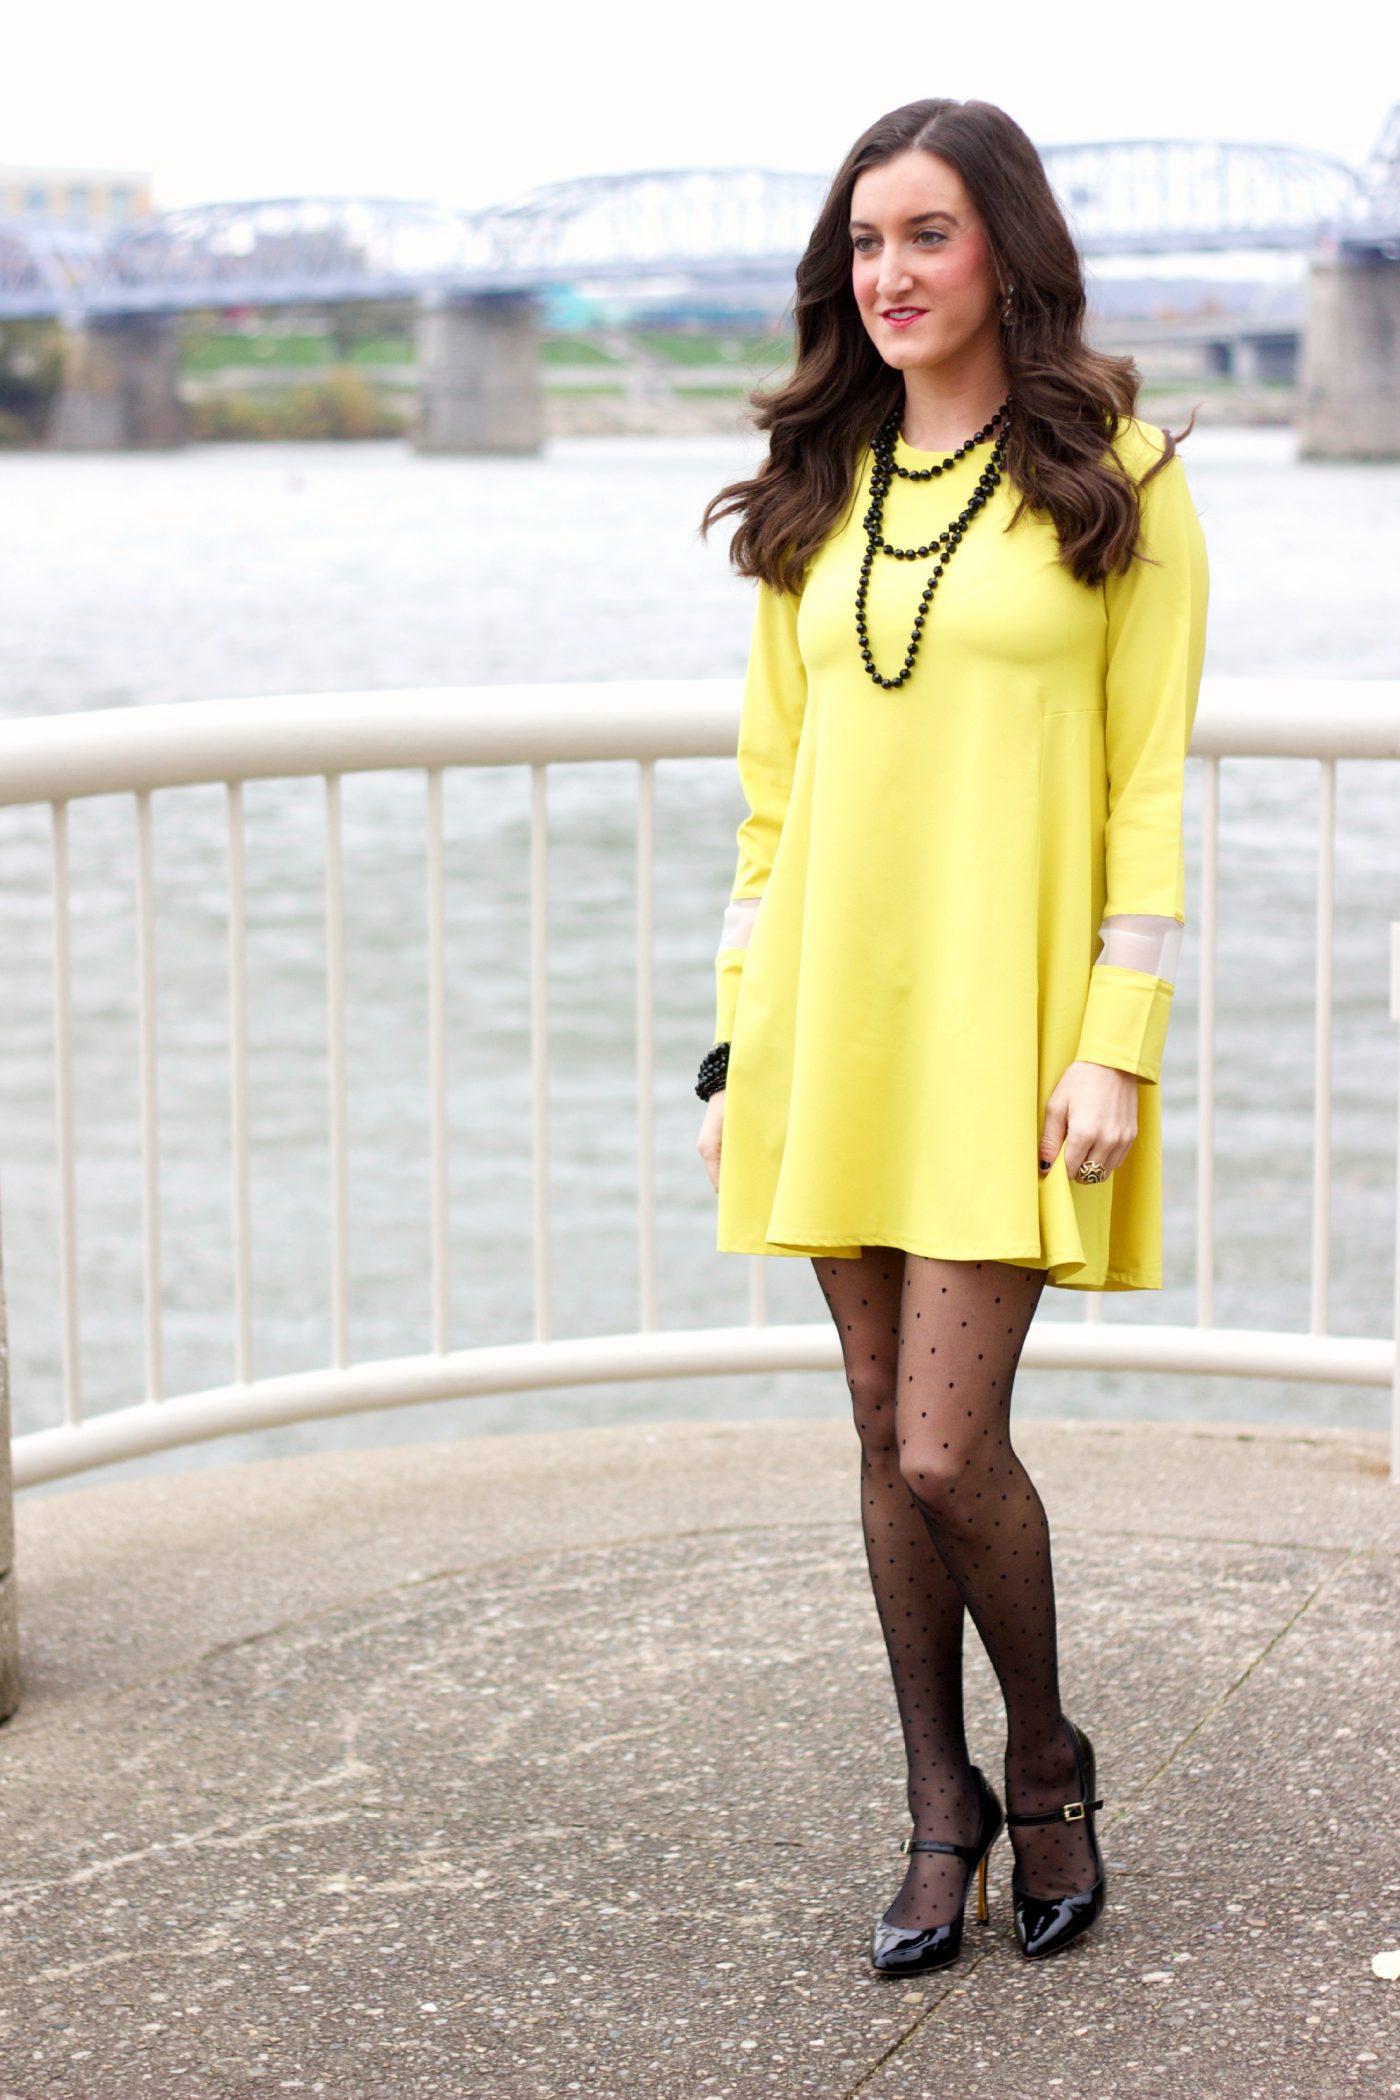 Yellow Long Sleeve Dress with Black Polka Dot Tights